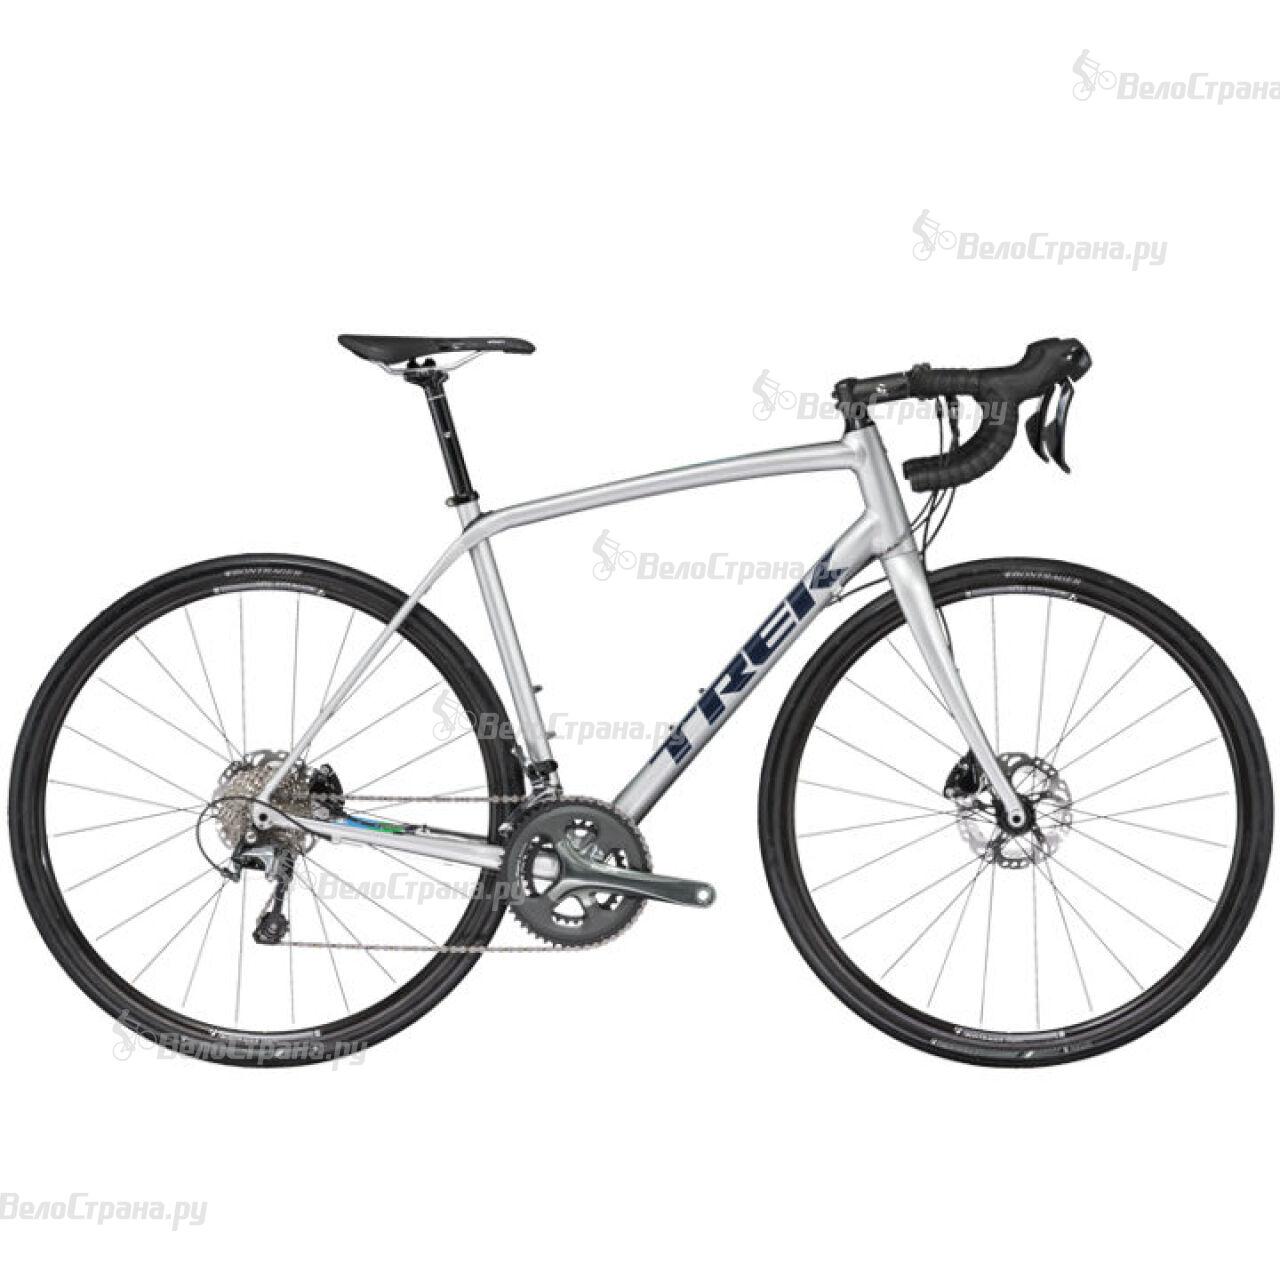 Велосипед Trek Domane ALR 4 Disc (2017) игра софтклаб the elder scrolls iii morrowind game of the year edition